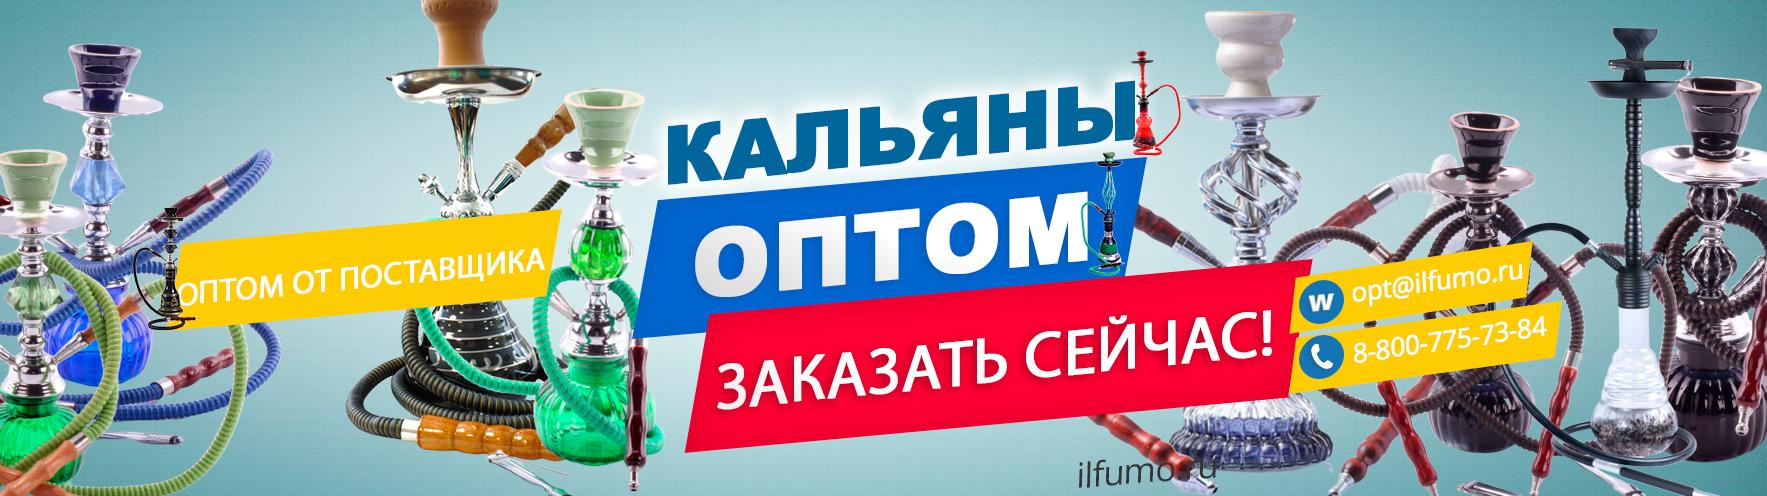 kaljany optom - Кальяны оптом